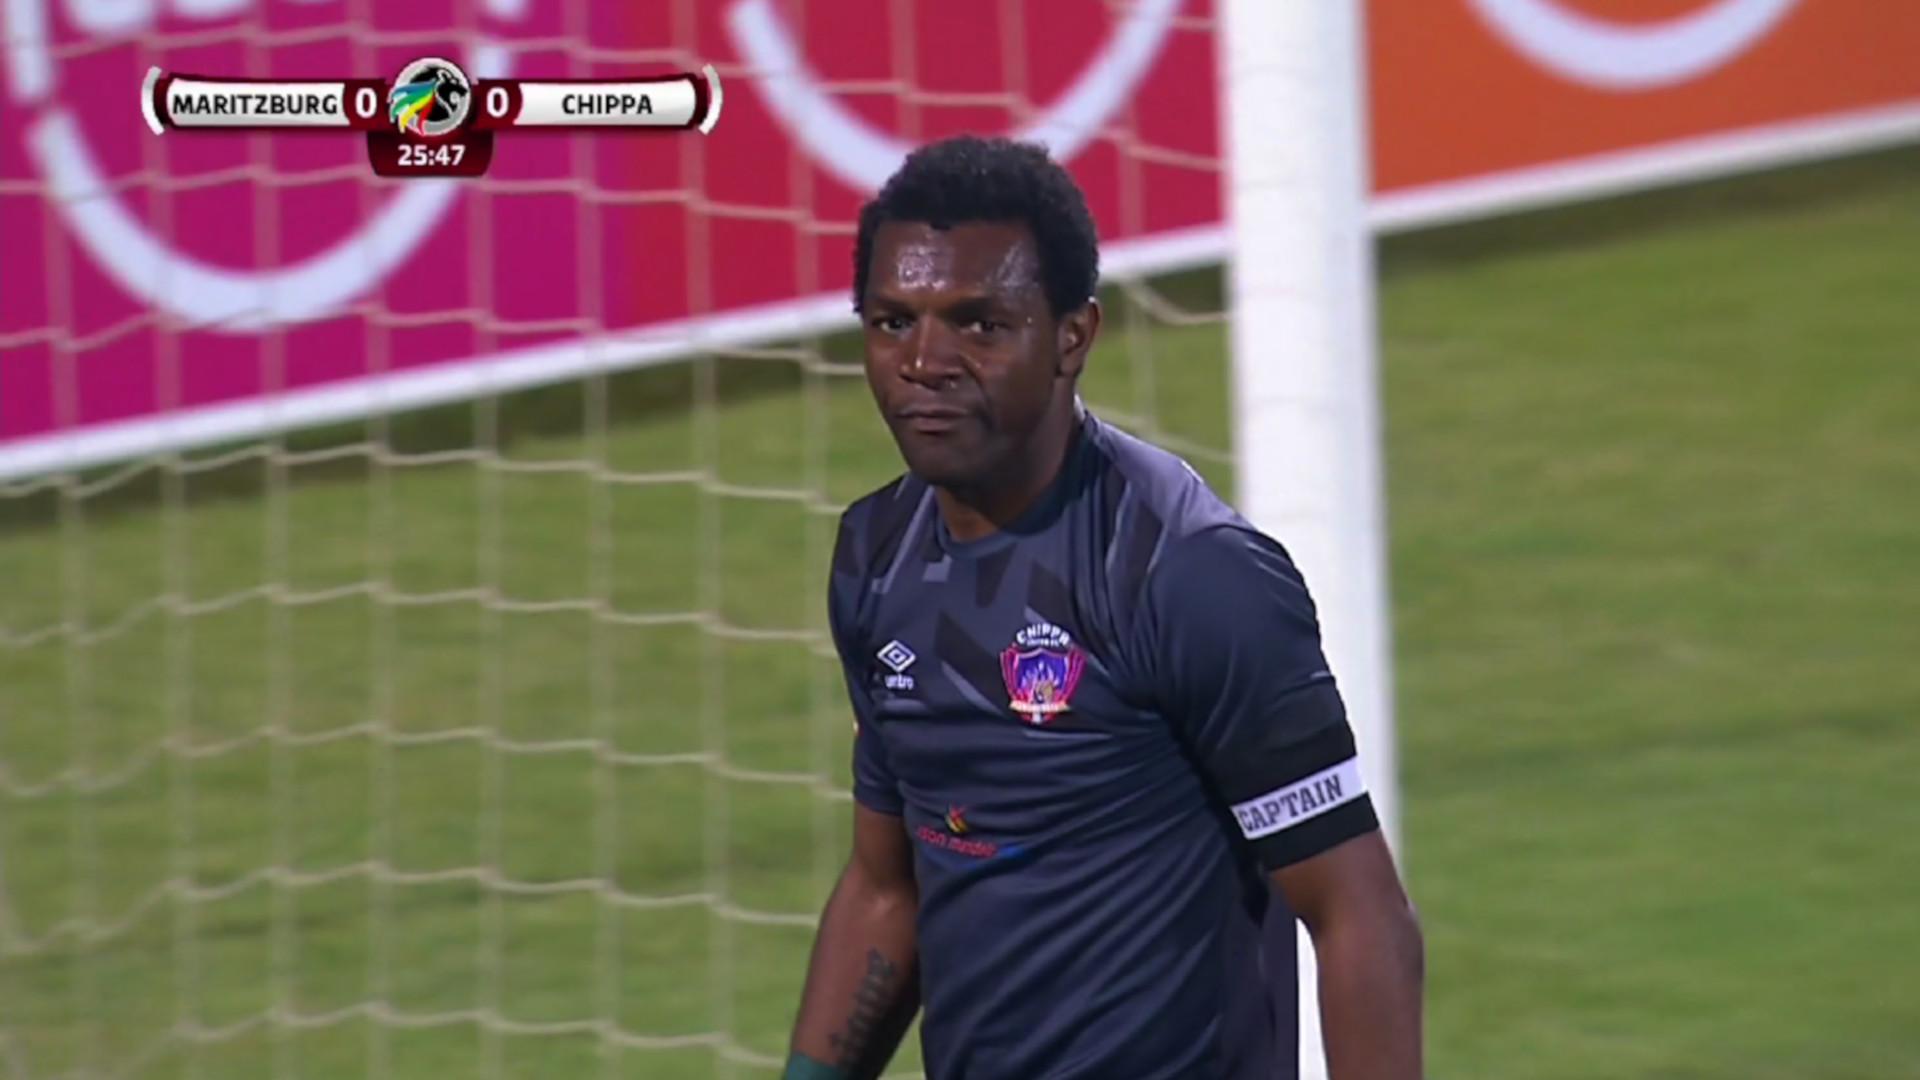 Absa Premiership | Maritzburg United v Chippa United | Patrick Tignyemb saves